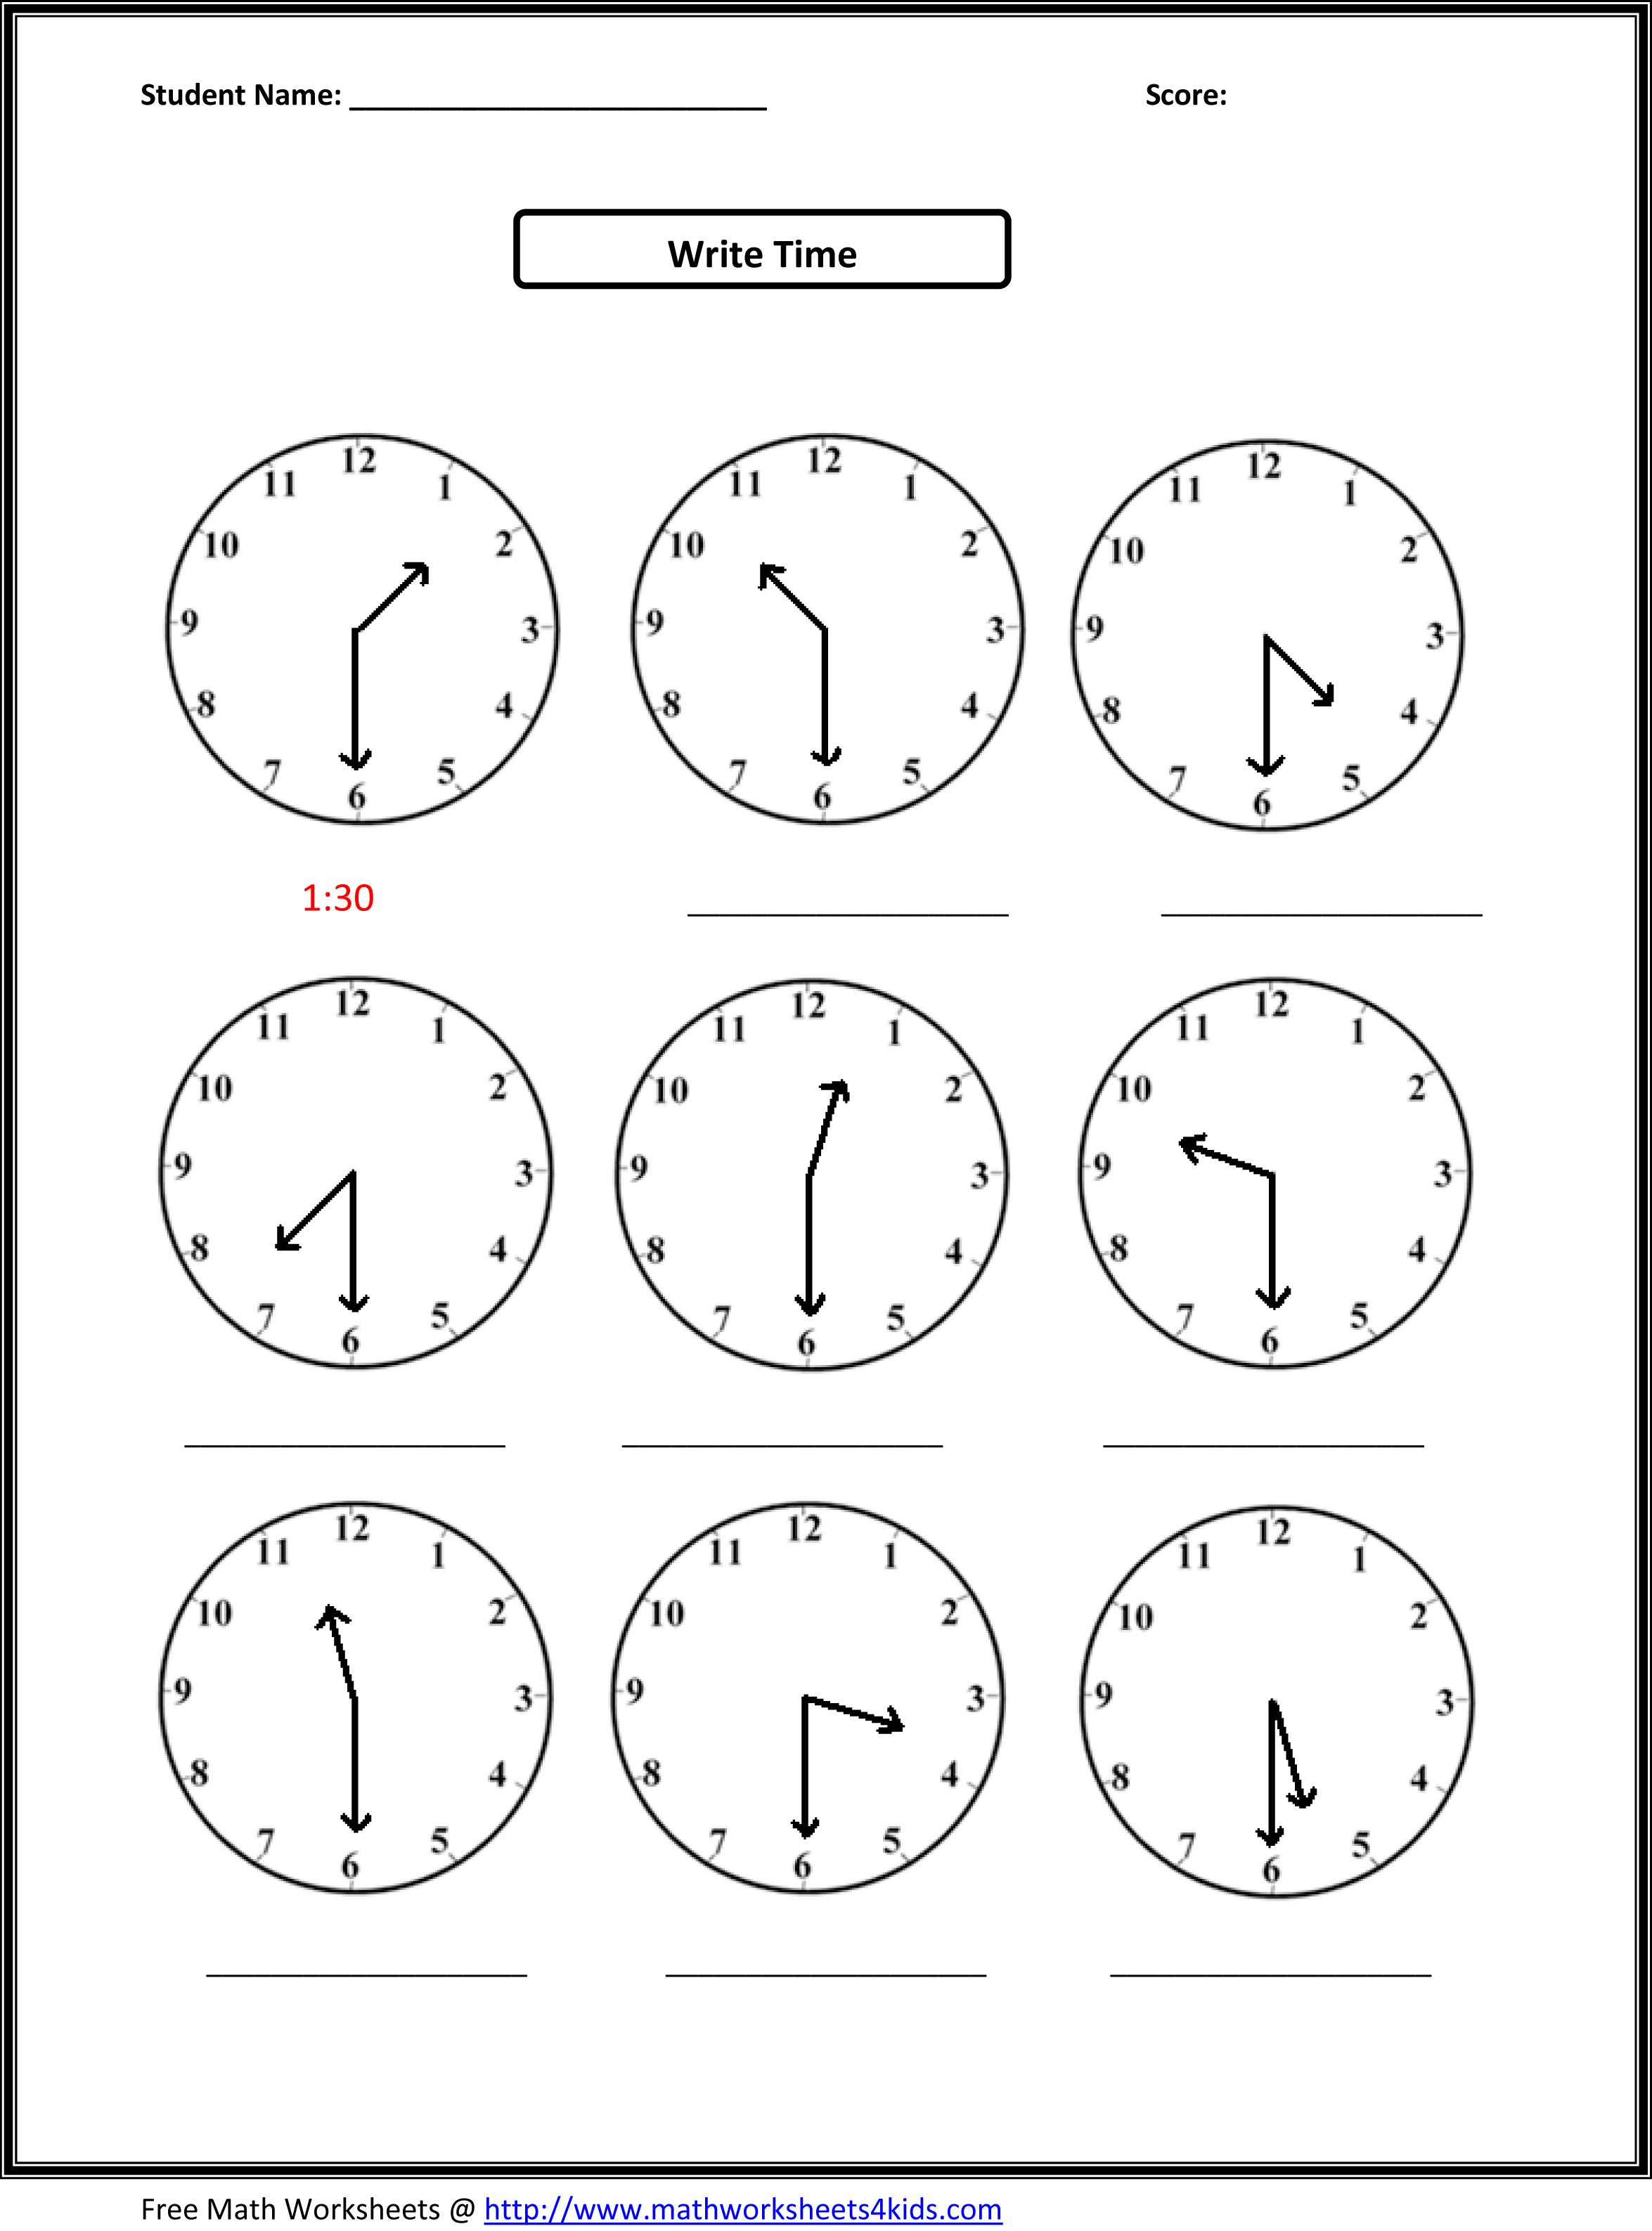 Calendar Math Worksheets For 2nd Grade Templates and Worksheets – Calendar Math Worksheet